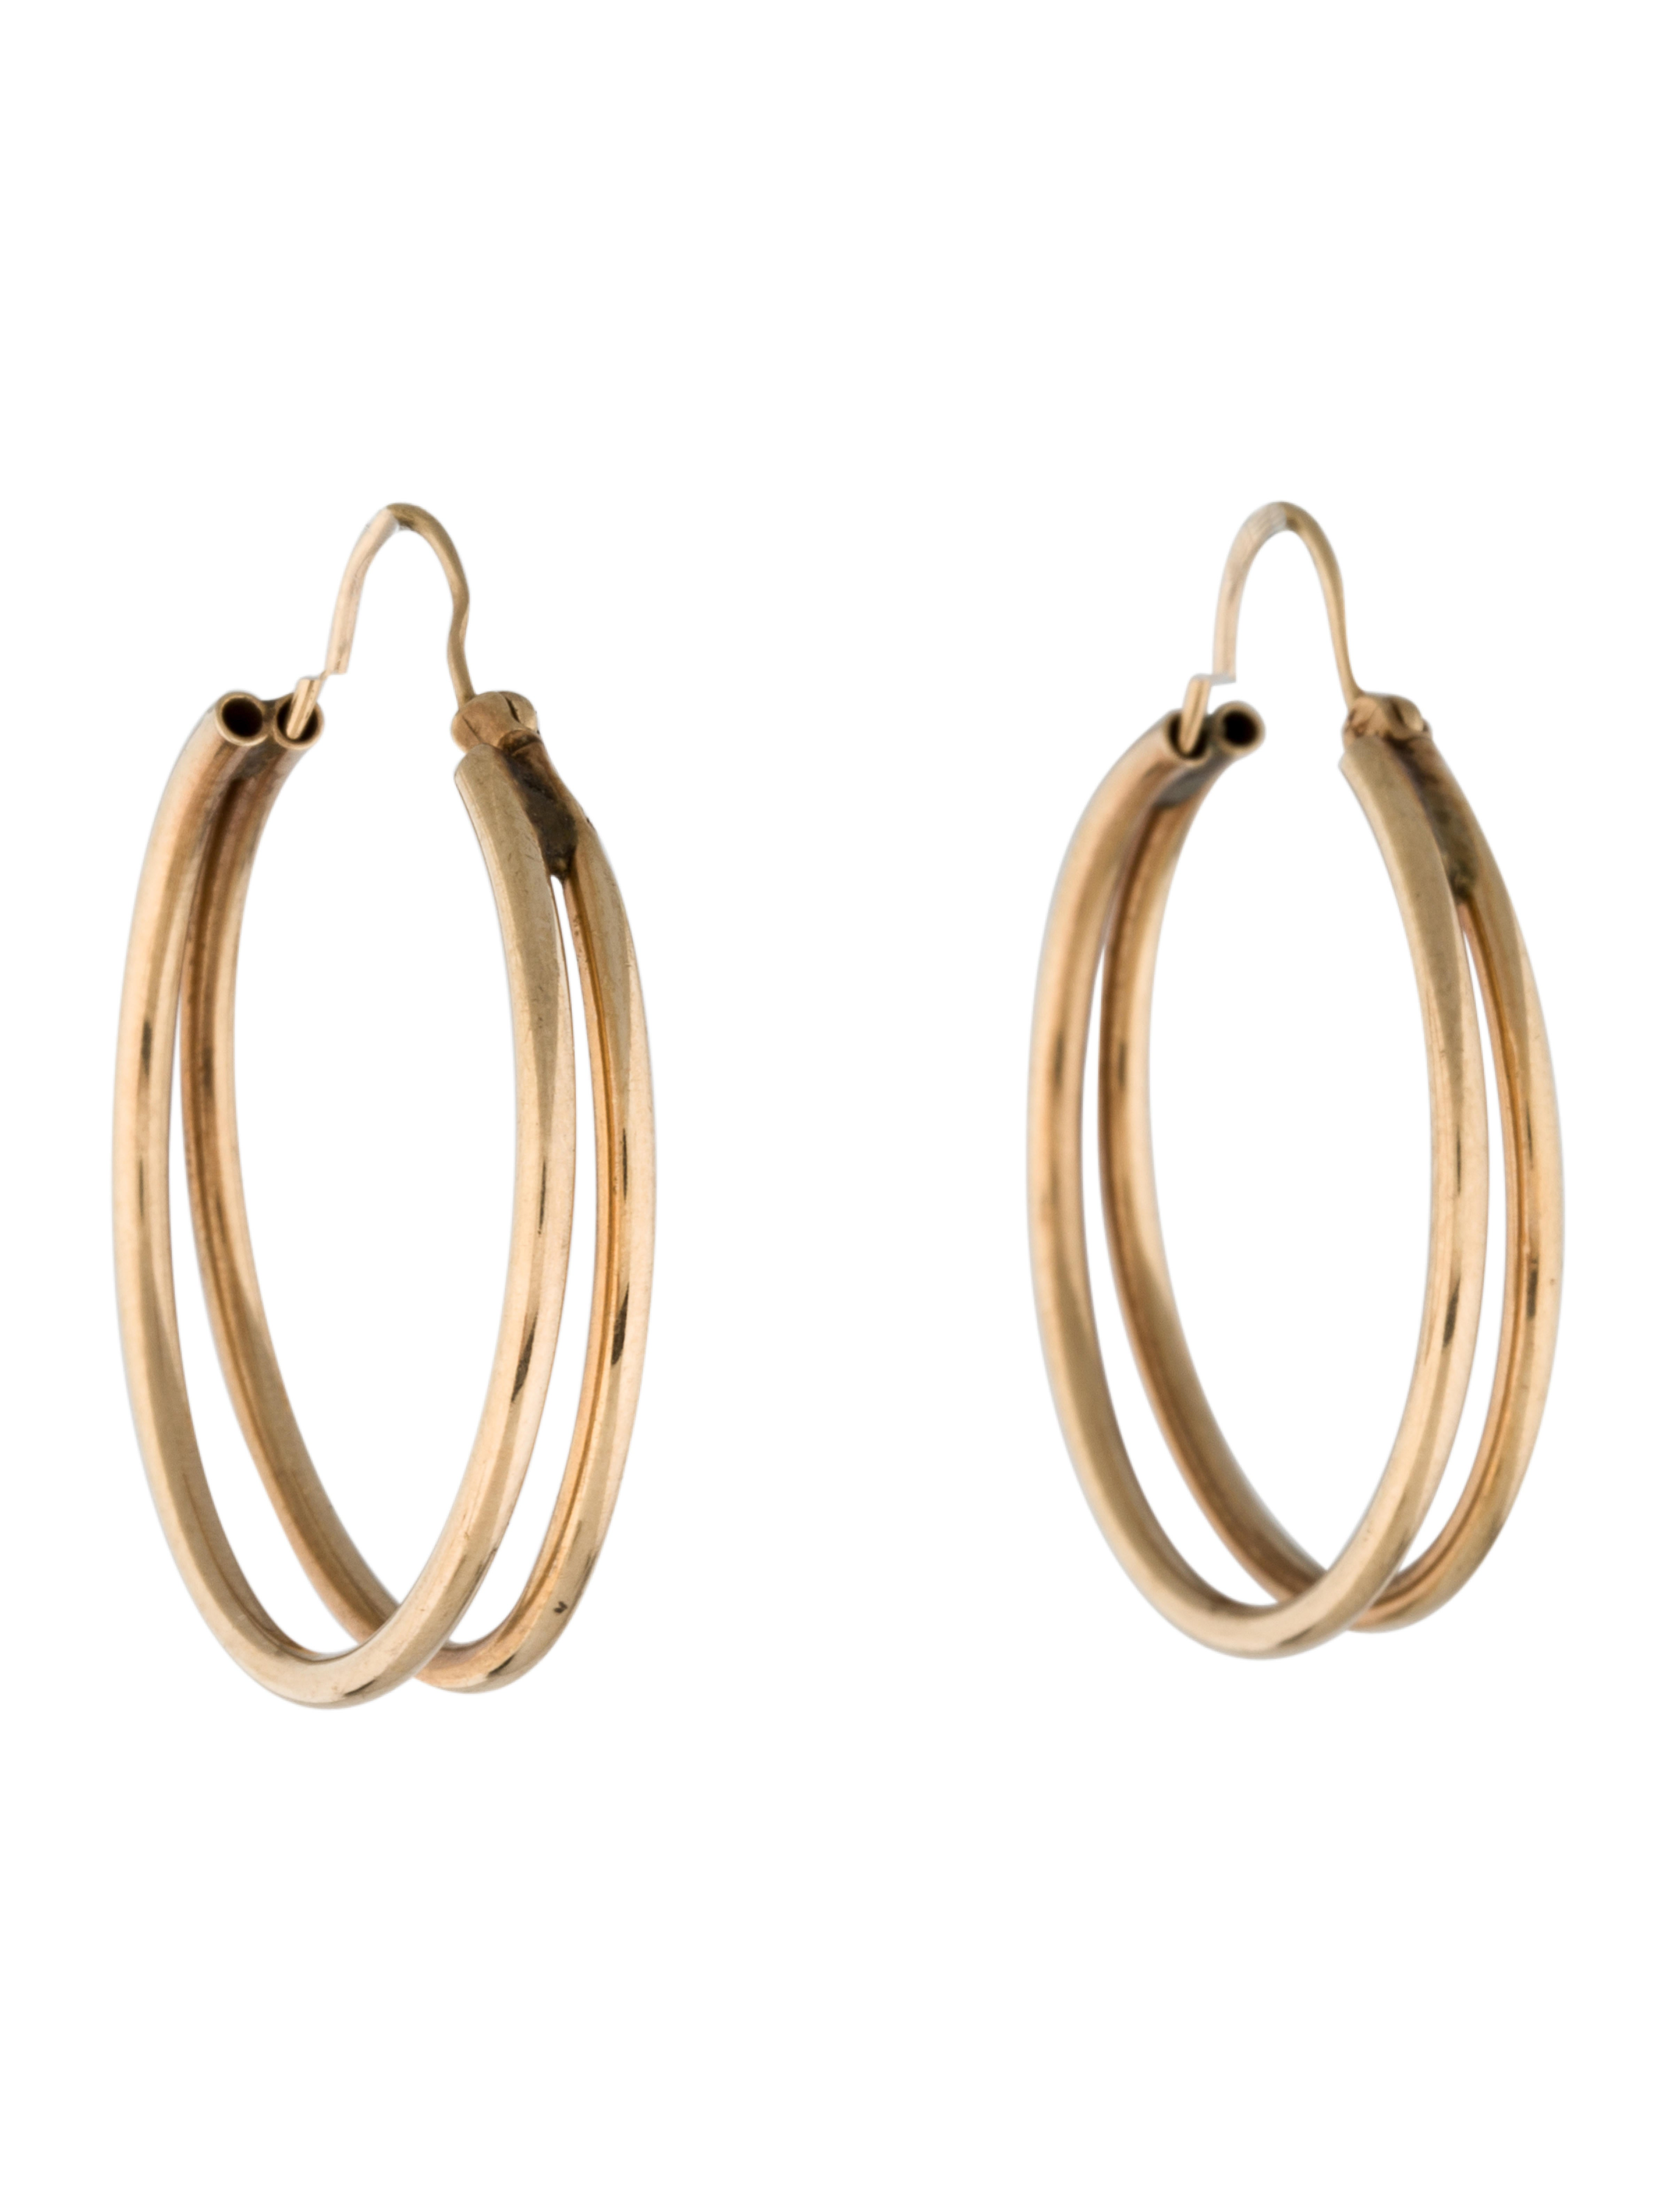 14k double hoop earrings earrings earri20001 the. Black Bedroom Furniture Sets. Home Design Ideas